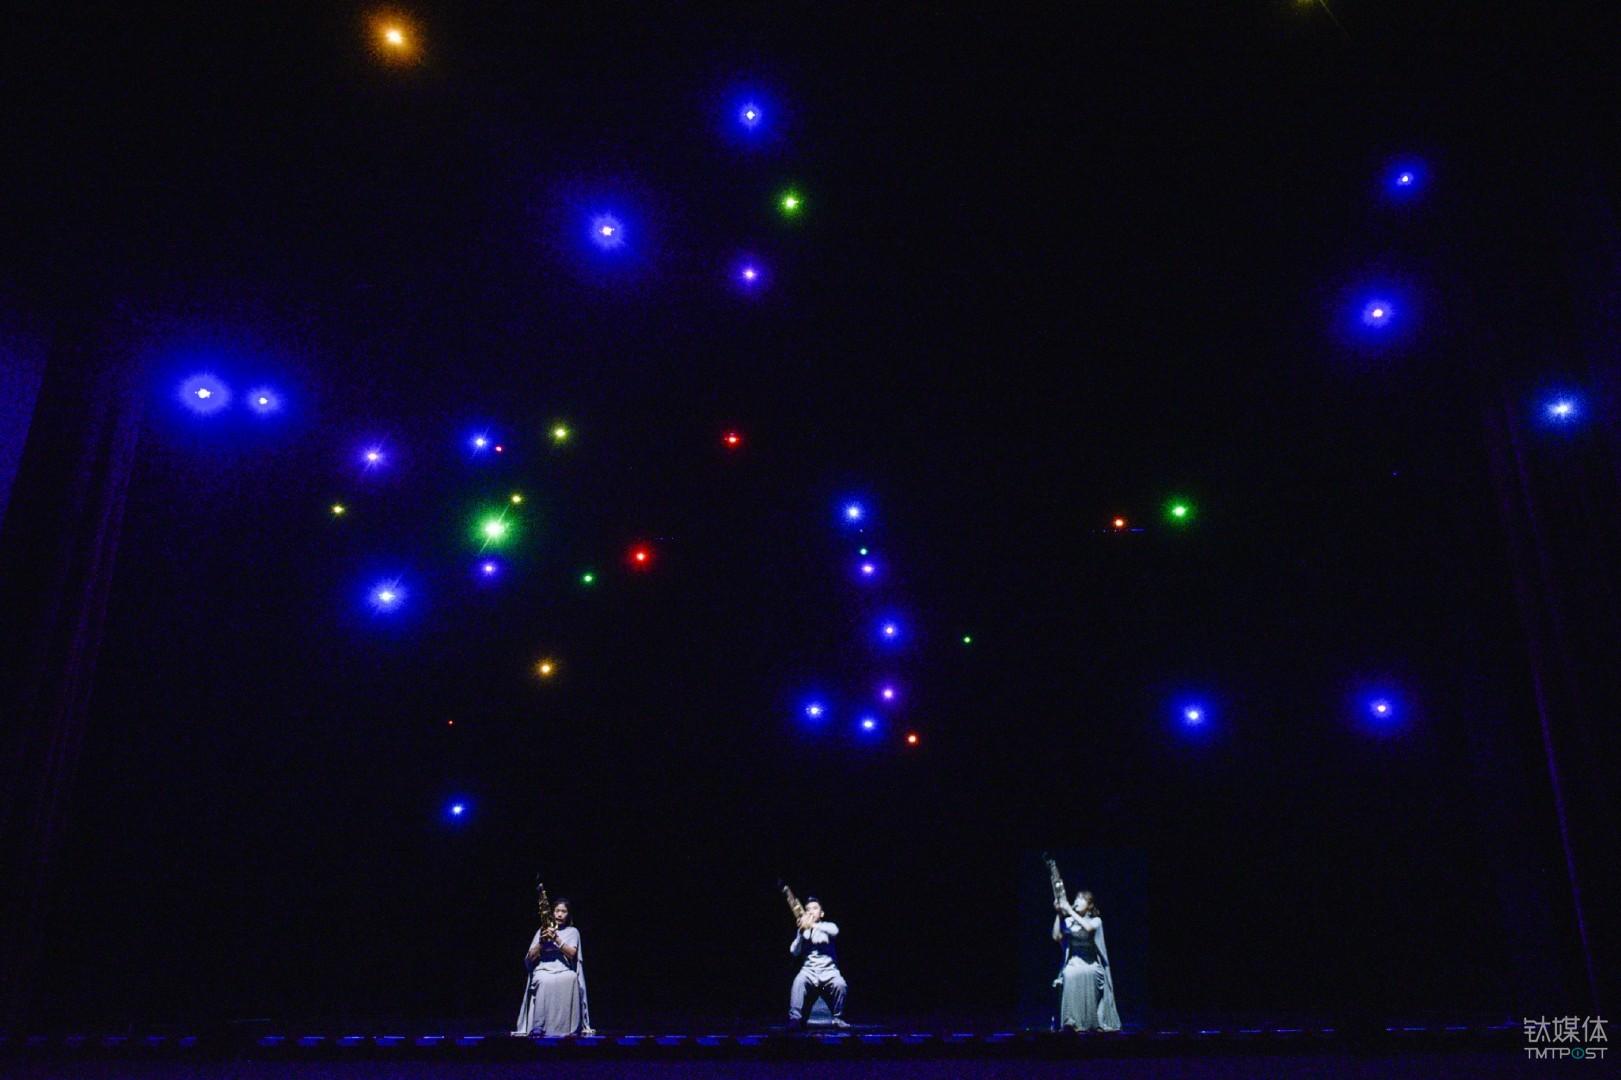 Synthetic Swarm 在国家大剧院舞台上的实际效果